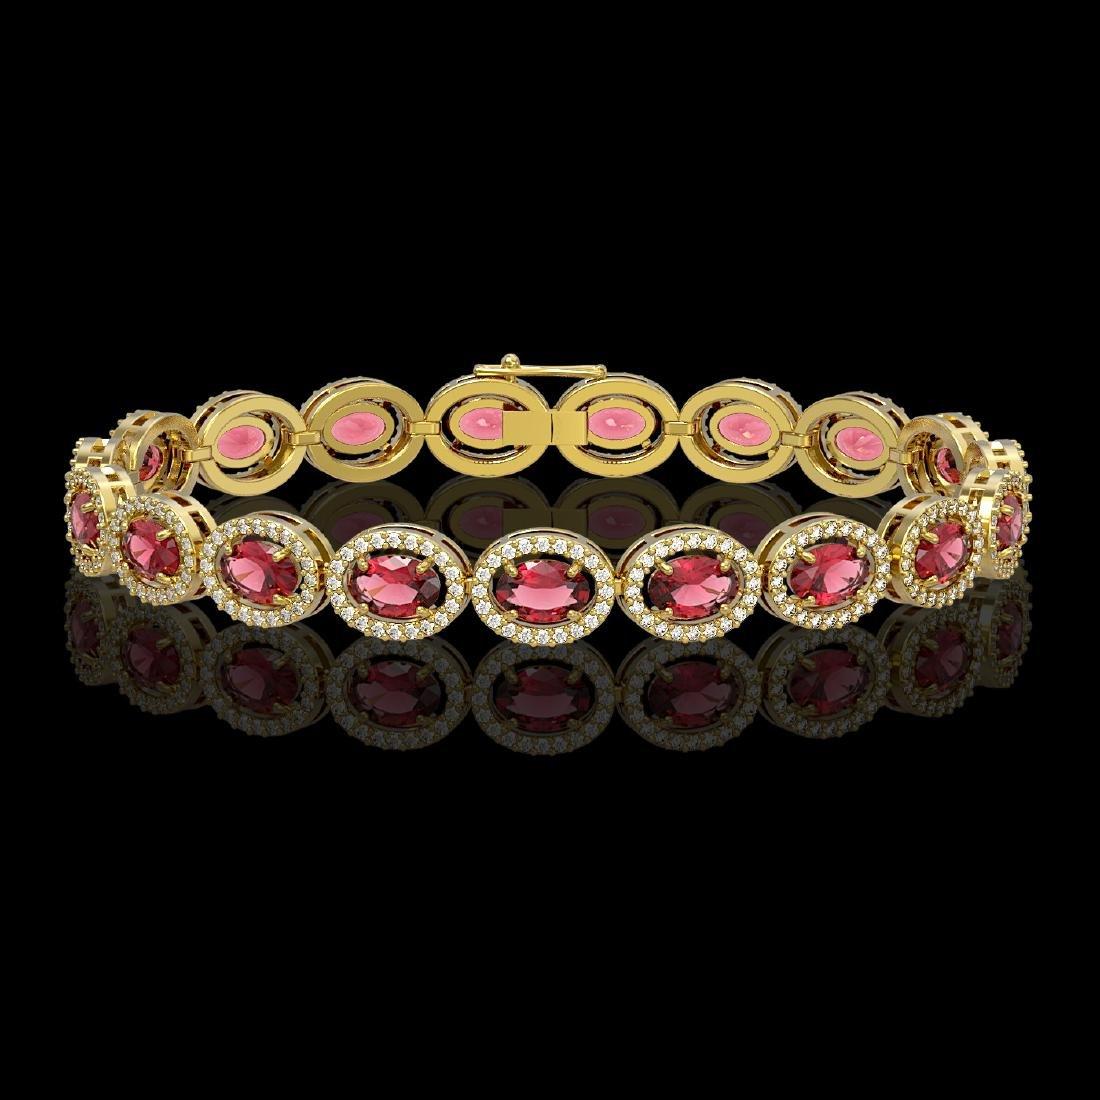 13.87 CTW Tourmaline & Diamond Halo Bracelet 10K Yellow